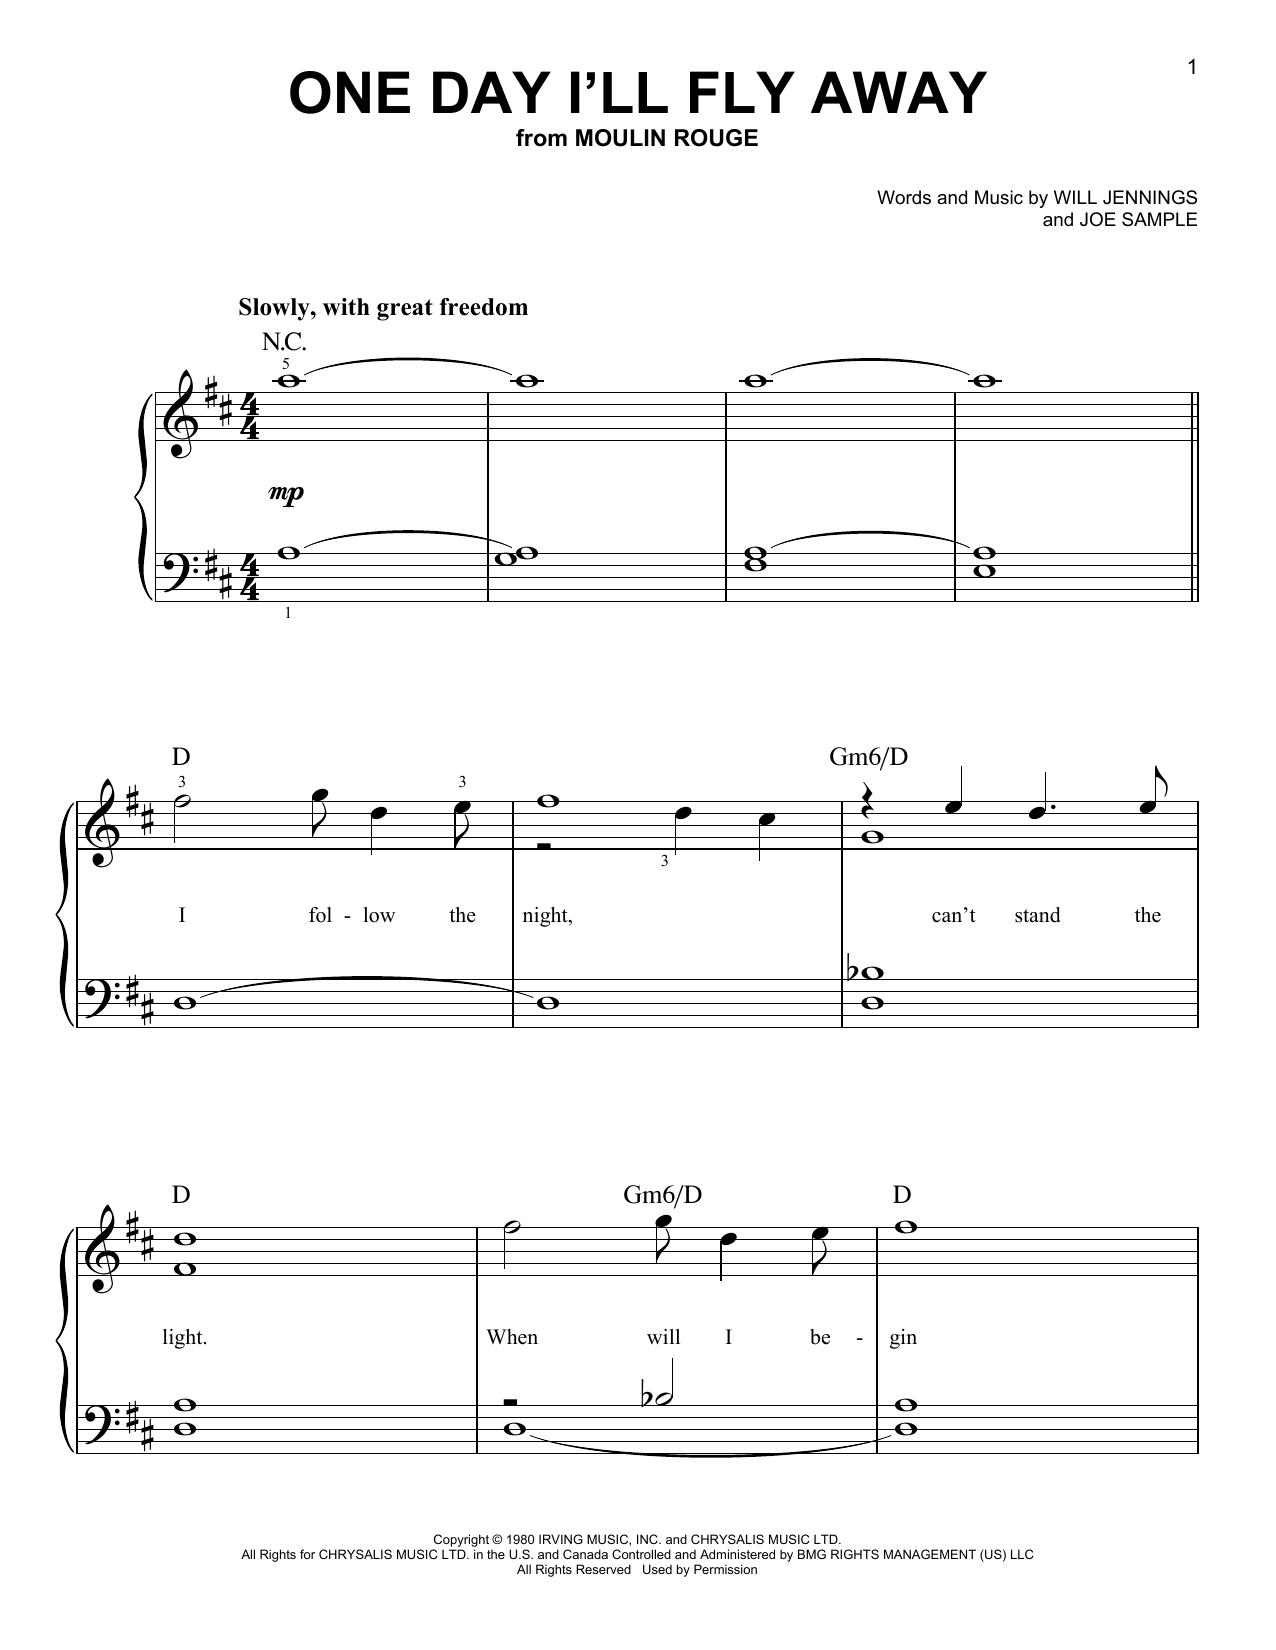 Sheet Music Digital Files To Print Licensed Joe Sample Digital